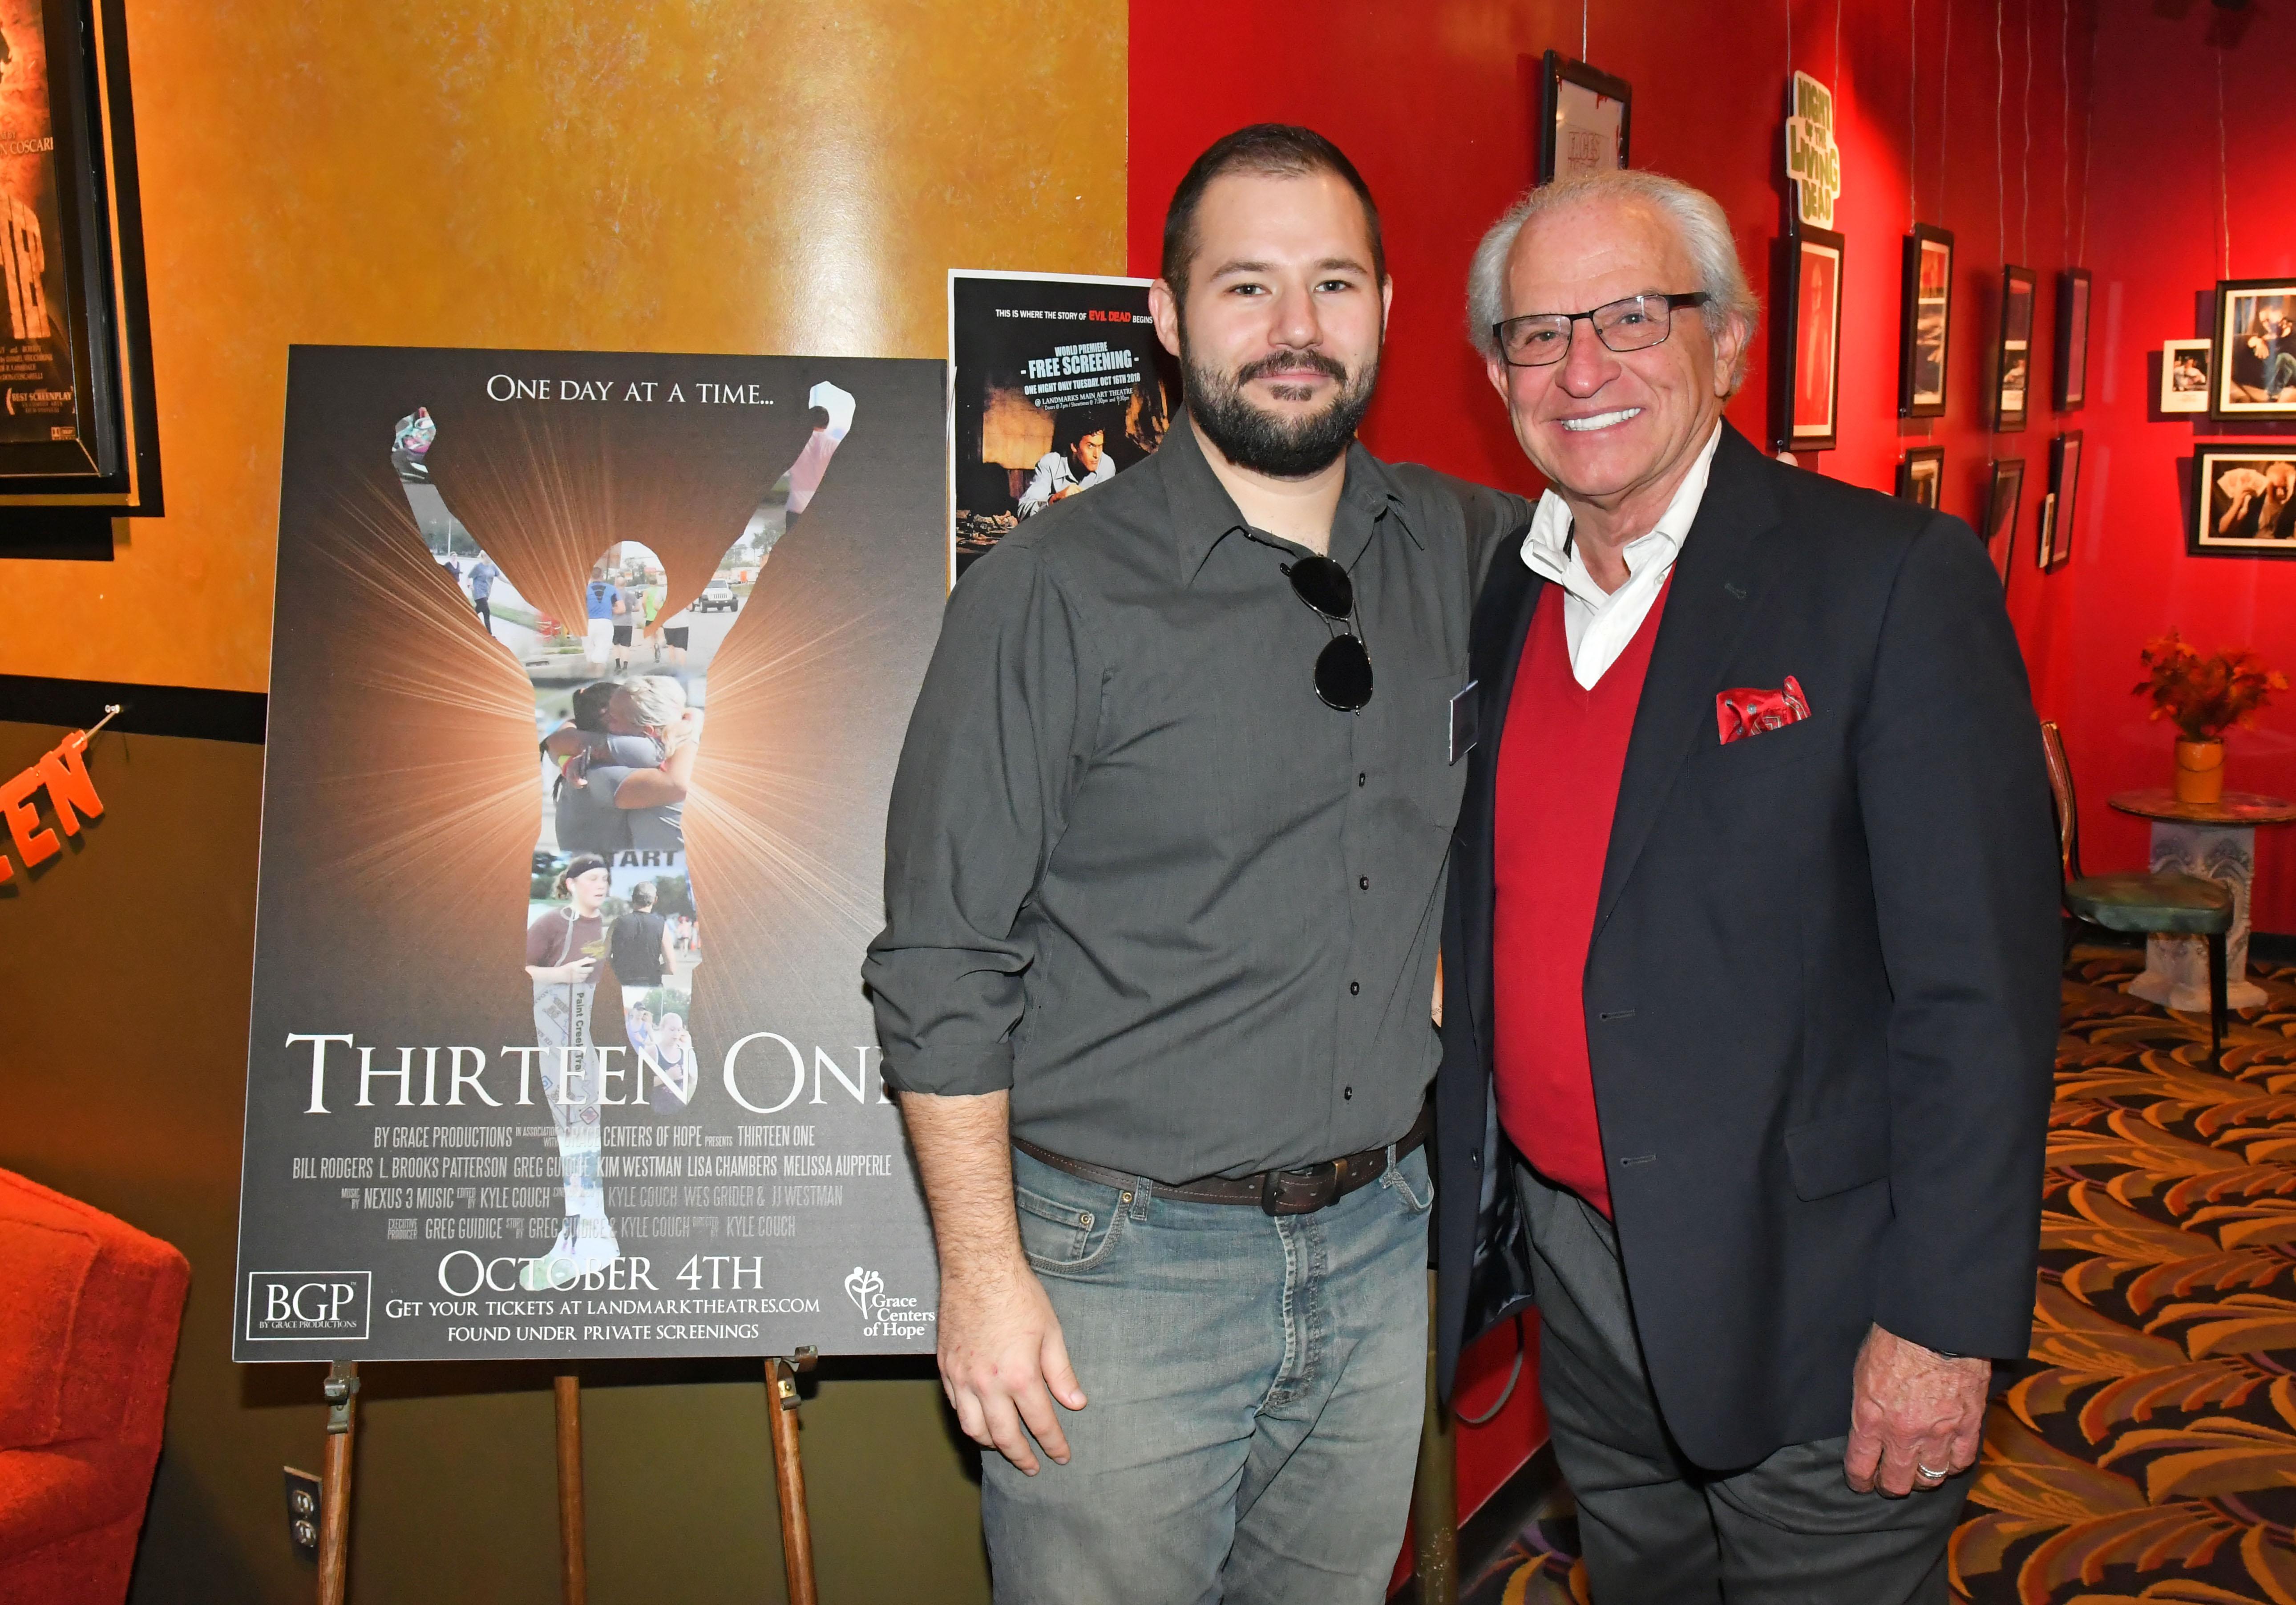 Thirteen One Premiere in Royal Oak, Michigan | By Grace